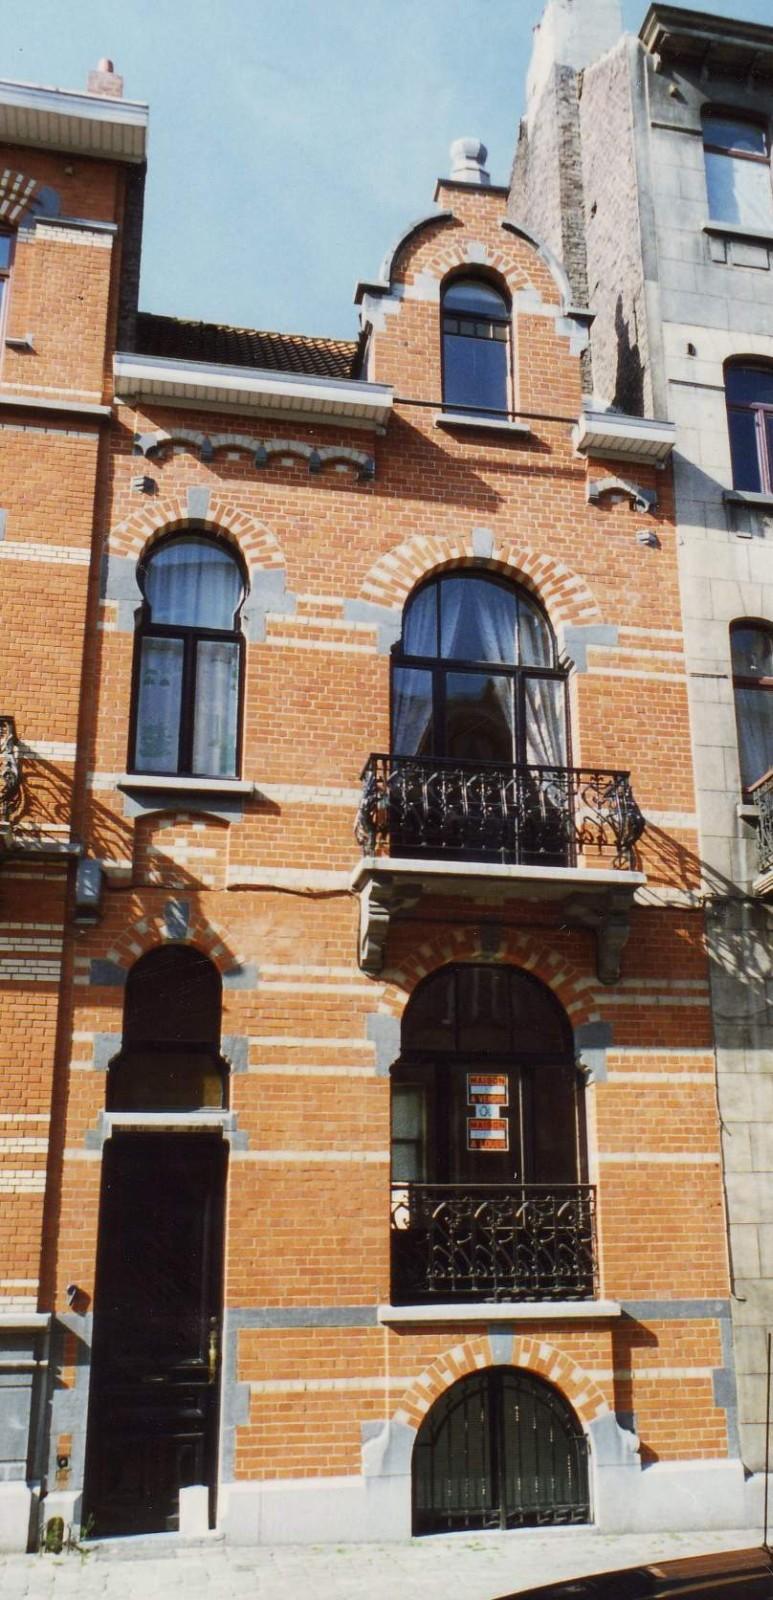 Rue des Coquelicots 9., 1993